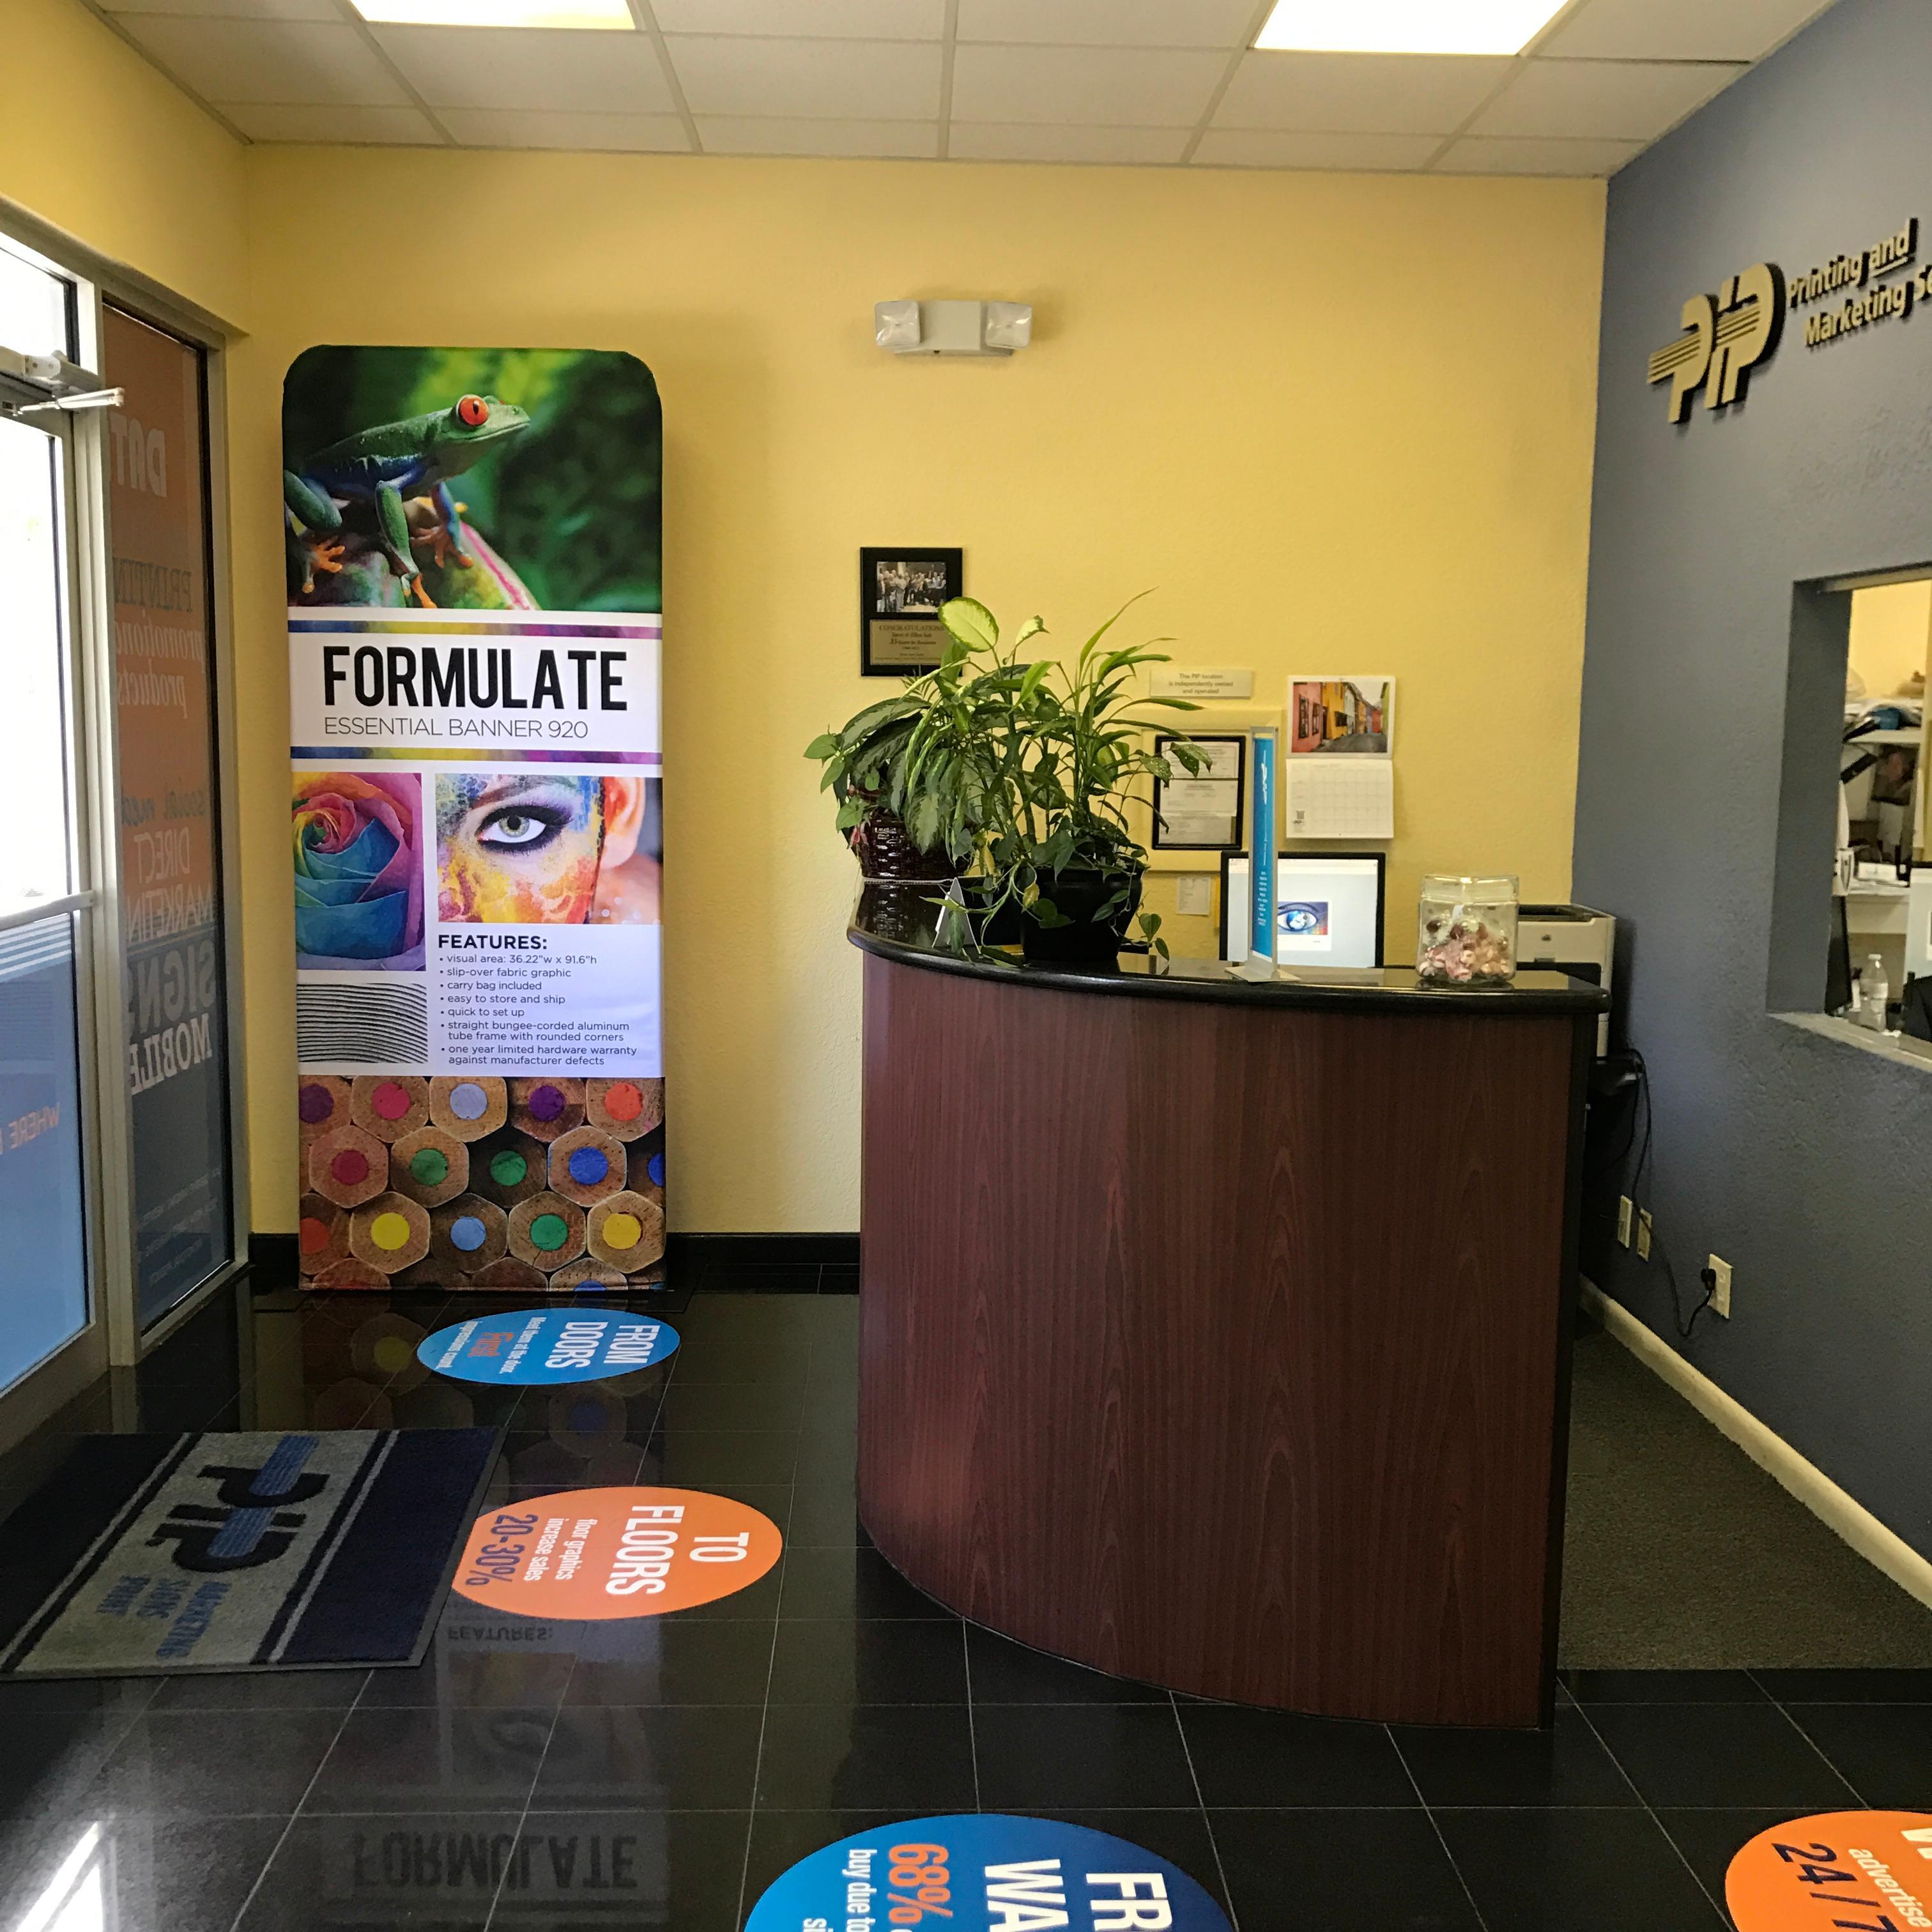 Window Graphics For Business Sunrise Fl >> Sunrise, FL pip marketing signs print | Find pip marketing signs print in Sunrise, FL